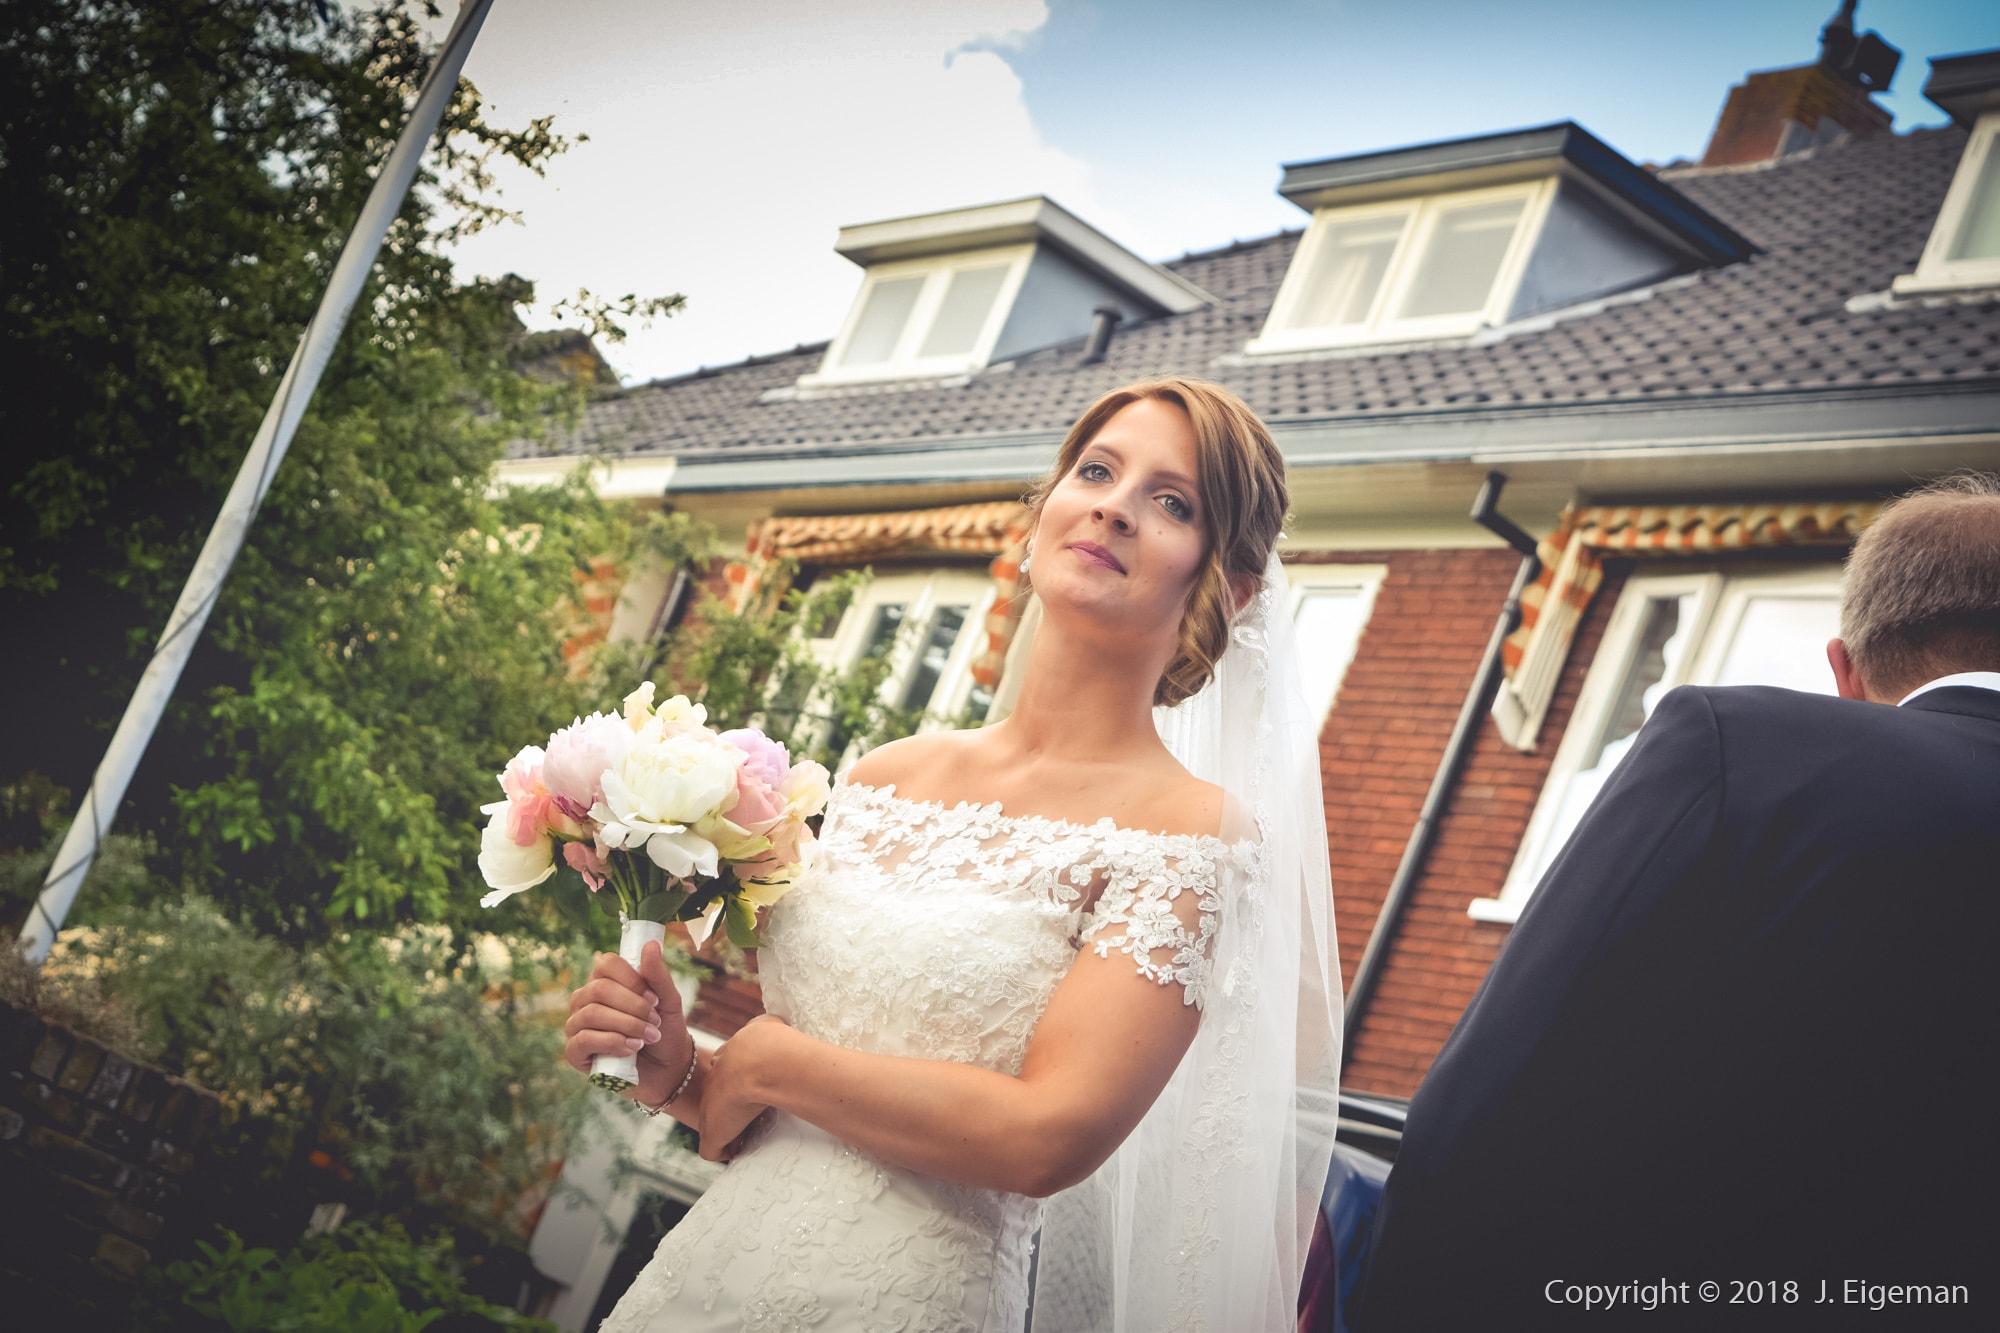 Bruiloft Fotografie Marquette Heemskerk Jeoffrey Eigeman